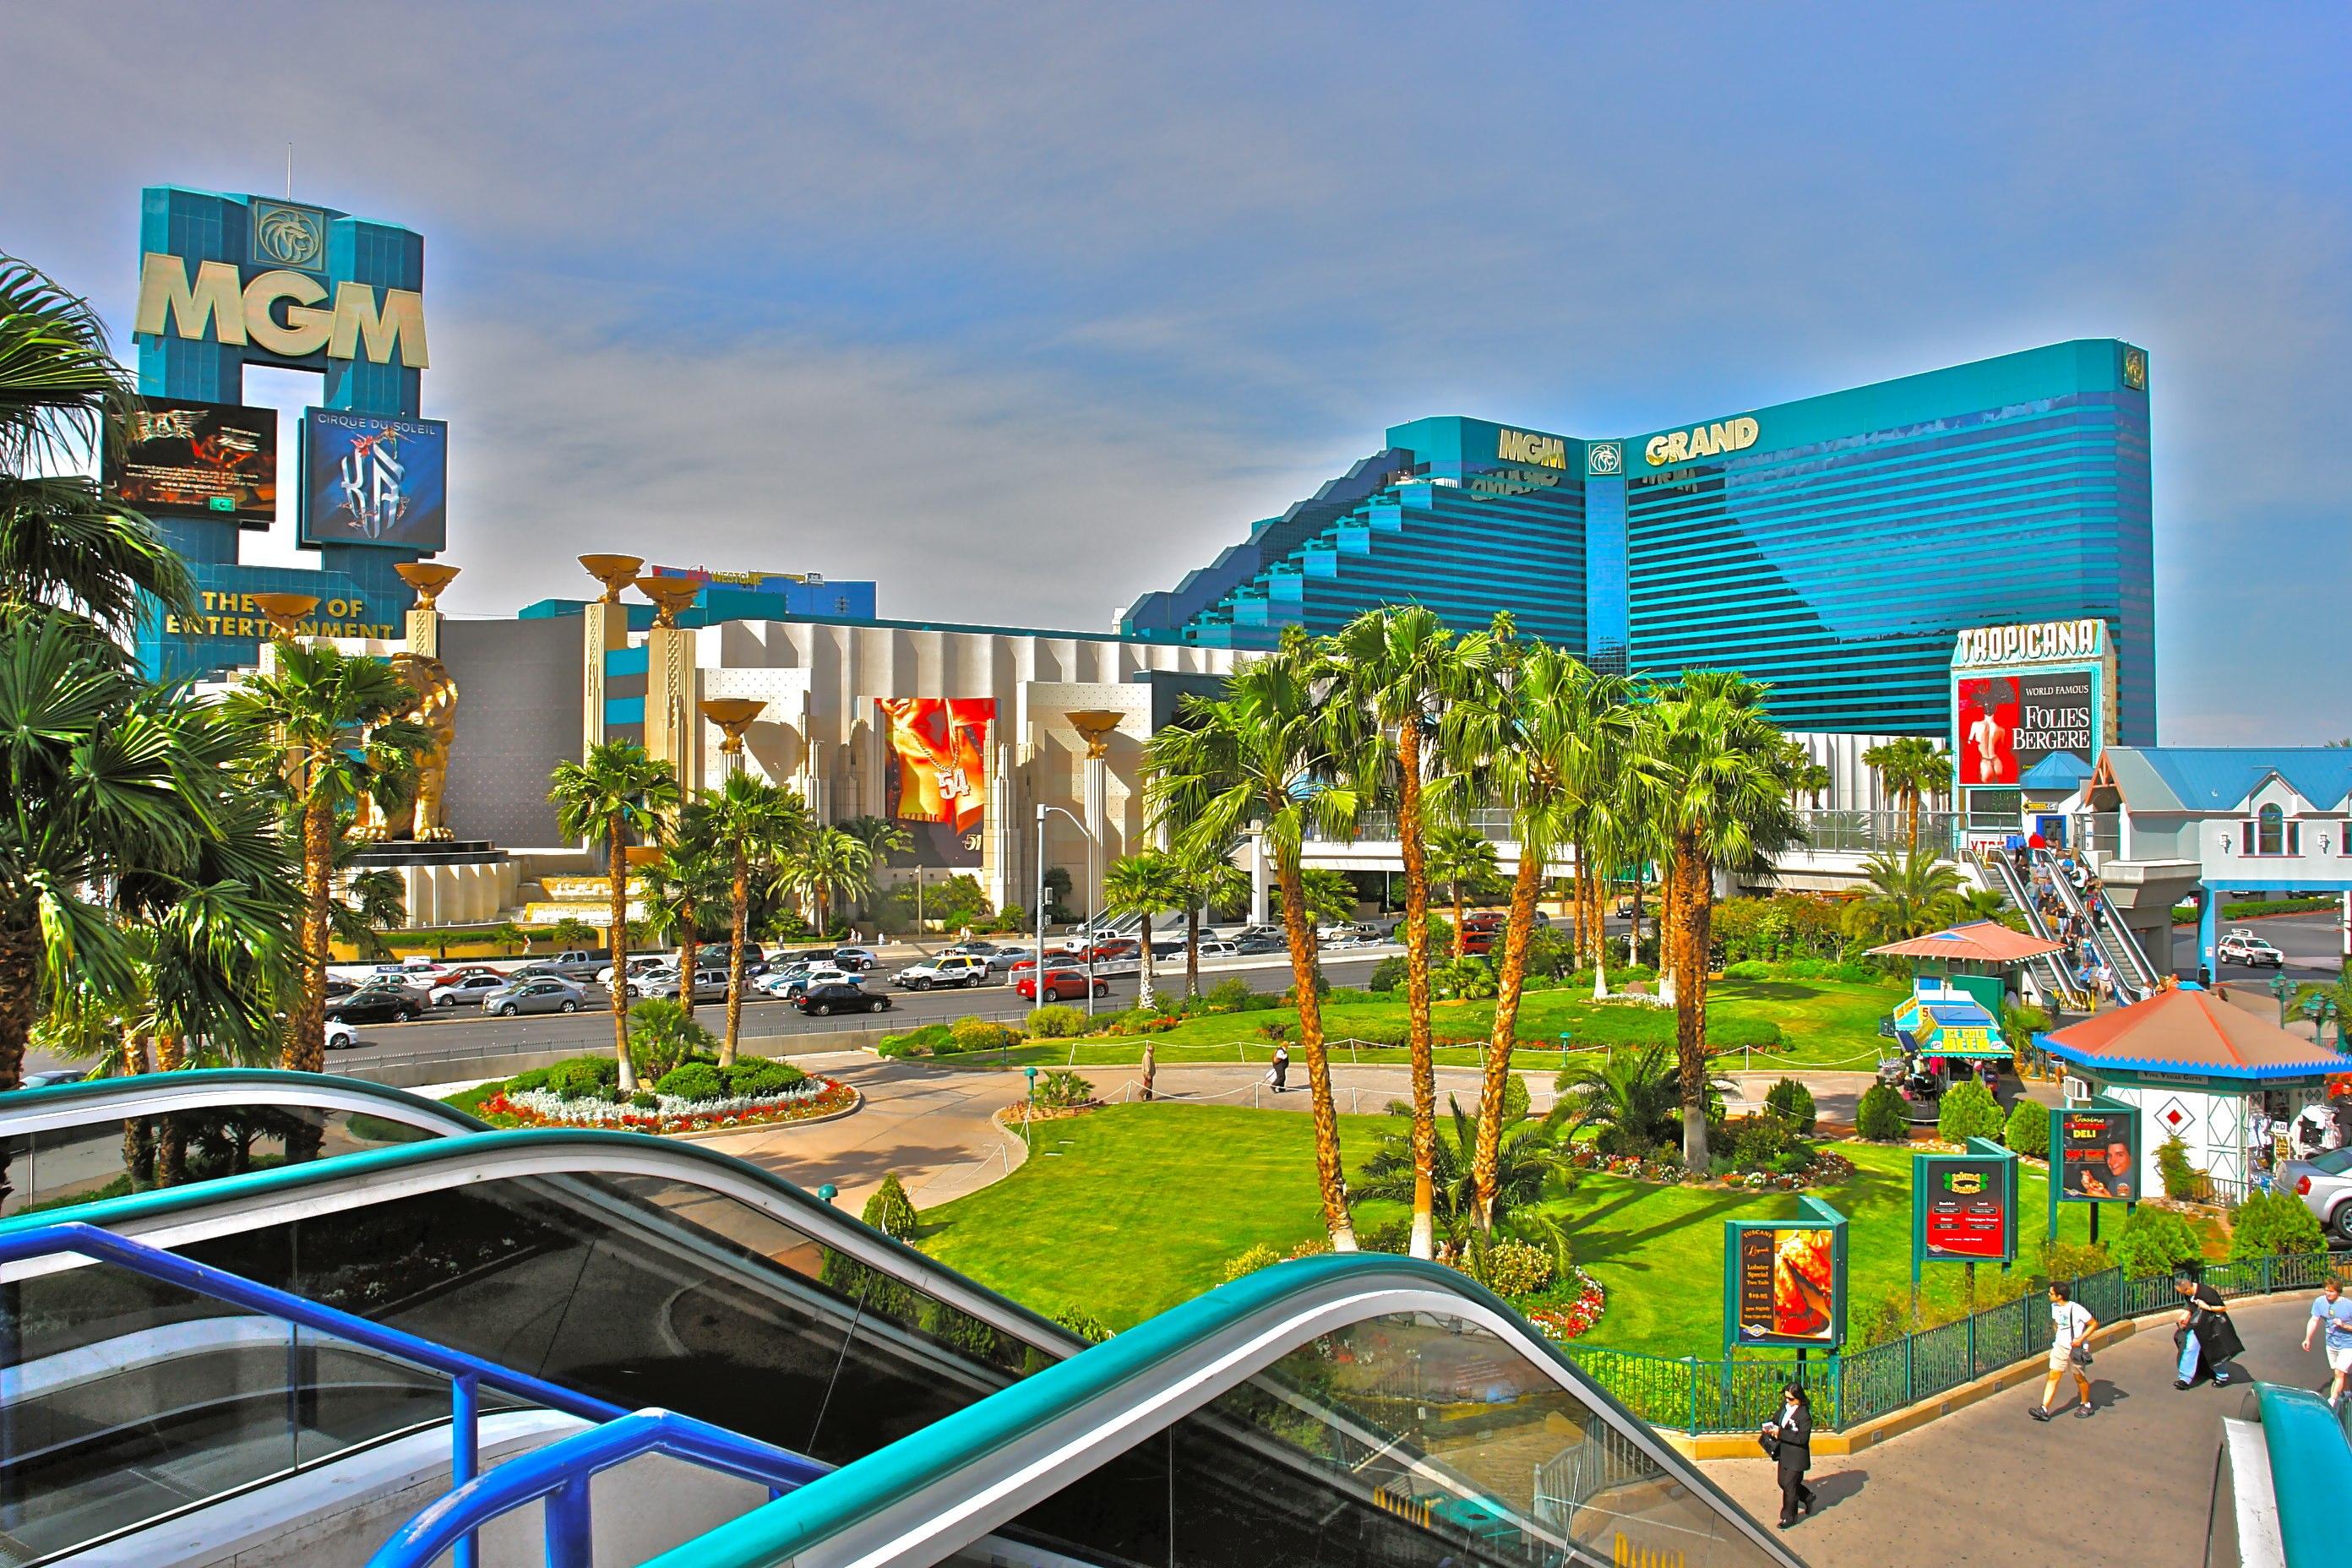 Mgm Grand Hotel Casino Las Vegas